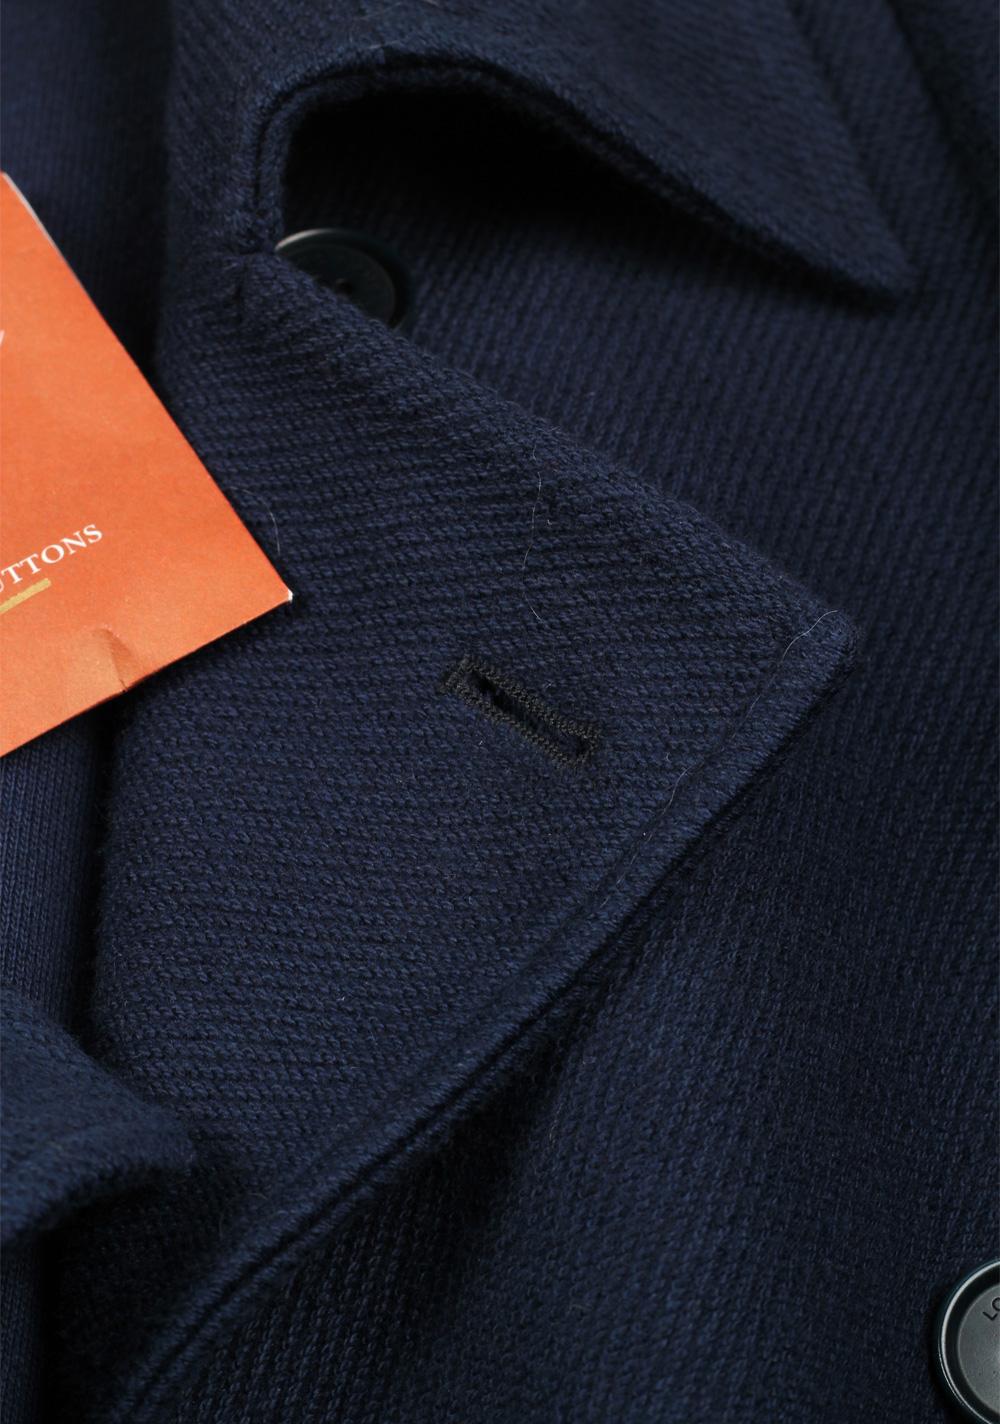 Loro Piana Blue Pea Coat Size XL Extra Large Outerwear | Costume Limité